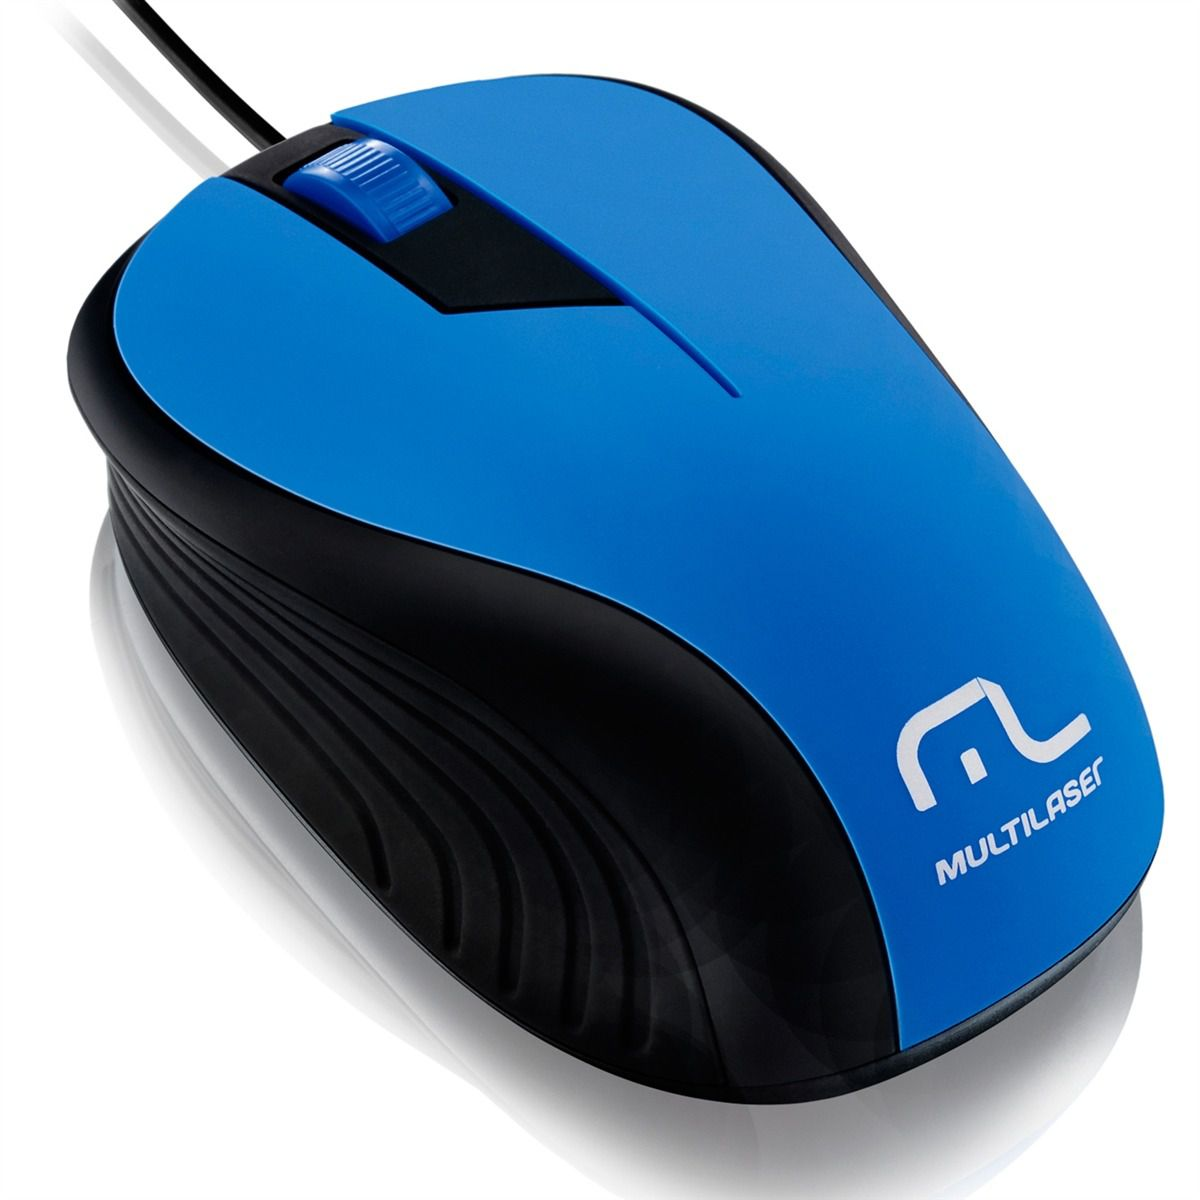 Mouse USB (embor) 1200dpi MO226 azul/preto - Multilaser